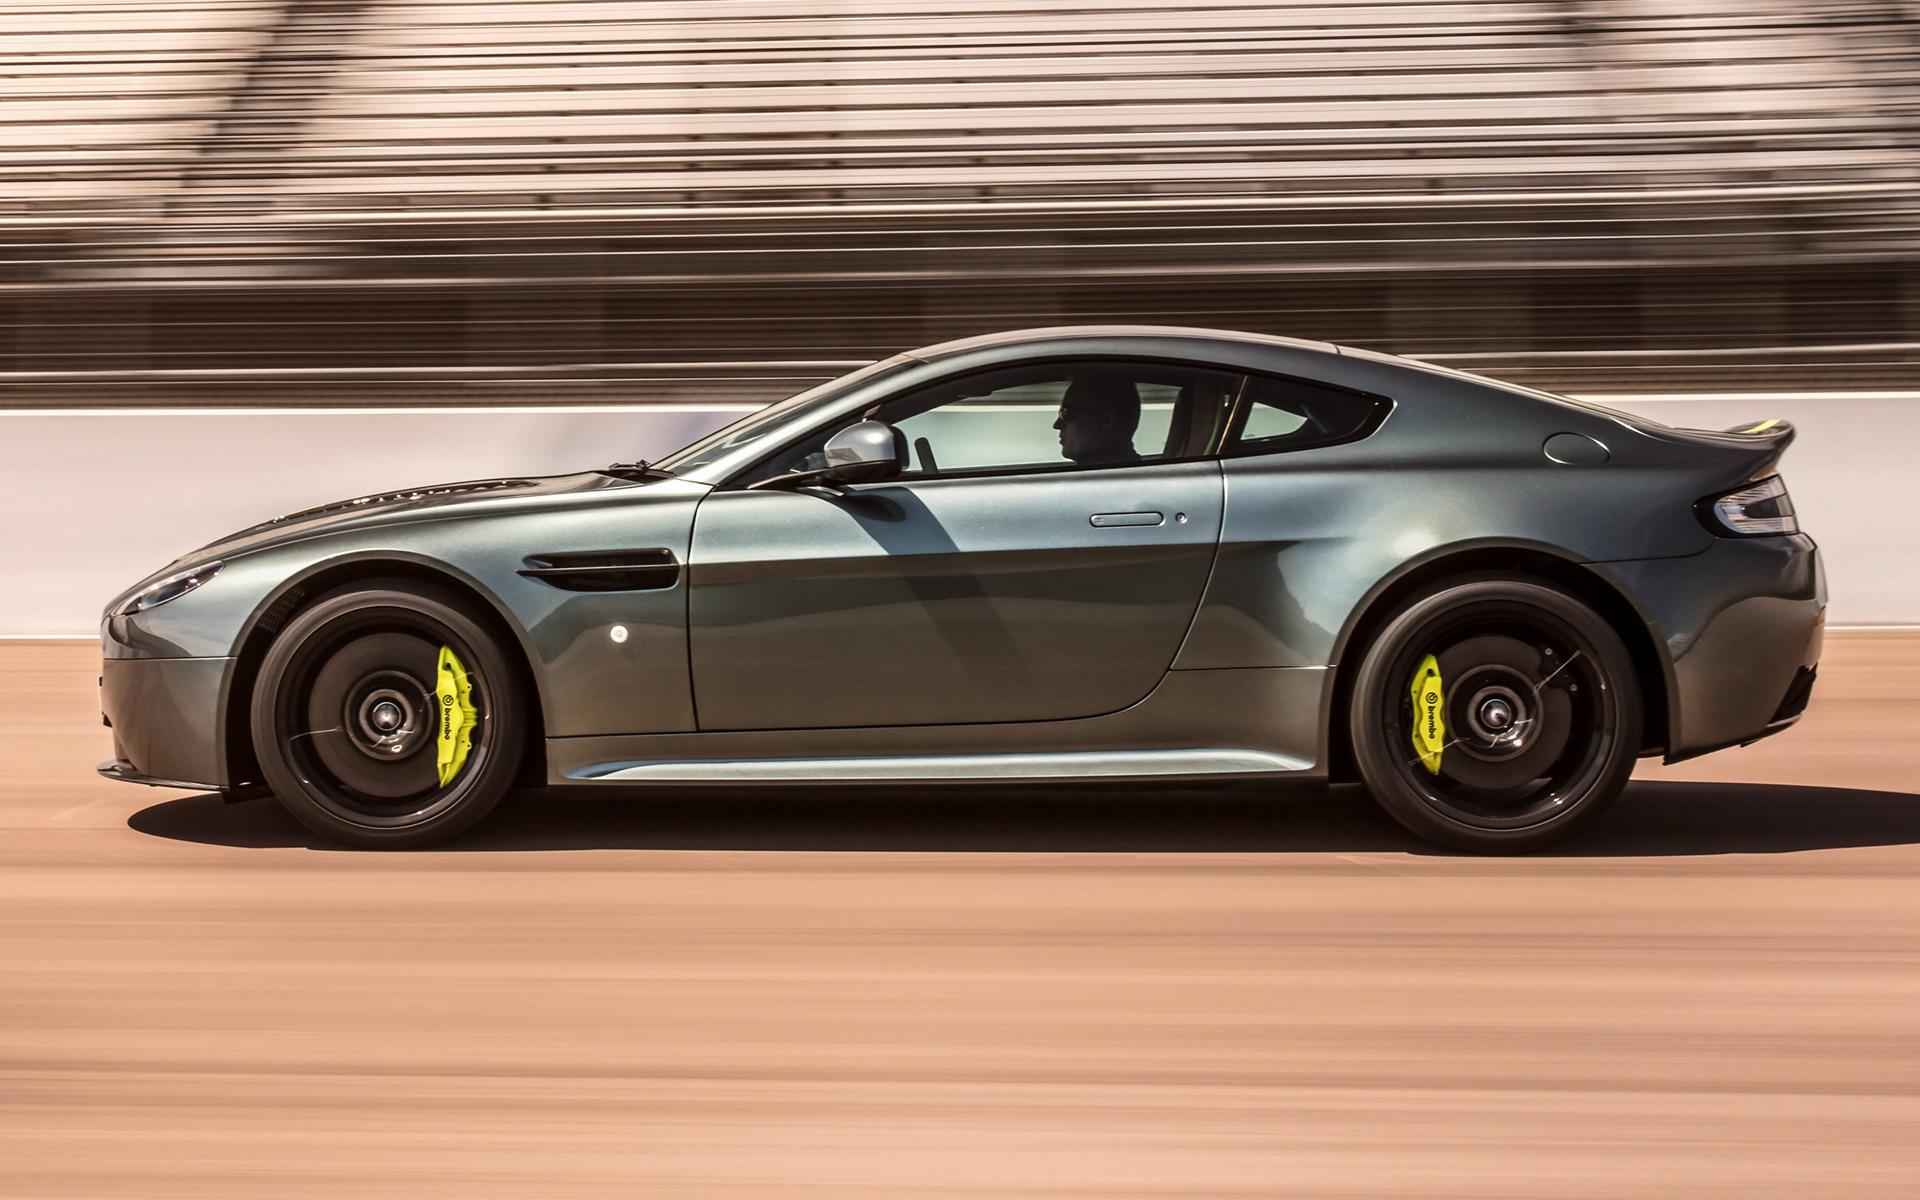 2017 Aston Martin V12 Vantage Amr Uk Hintergrundbilder Und Wallpaper In Hd Car Pixel